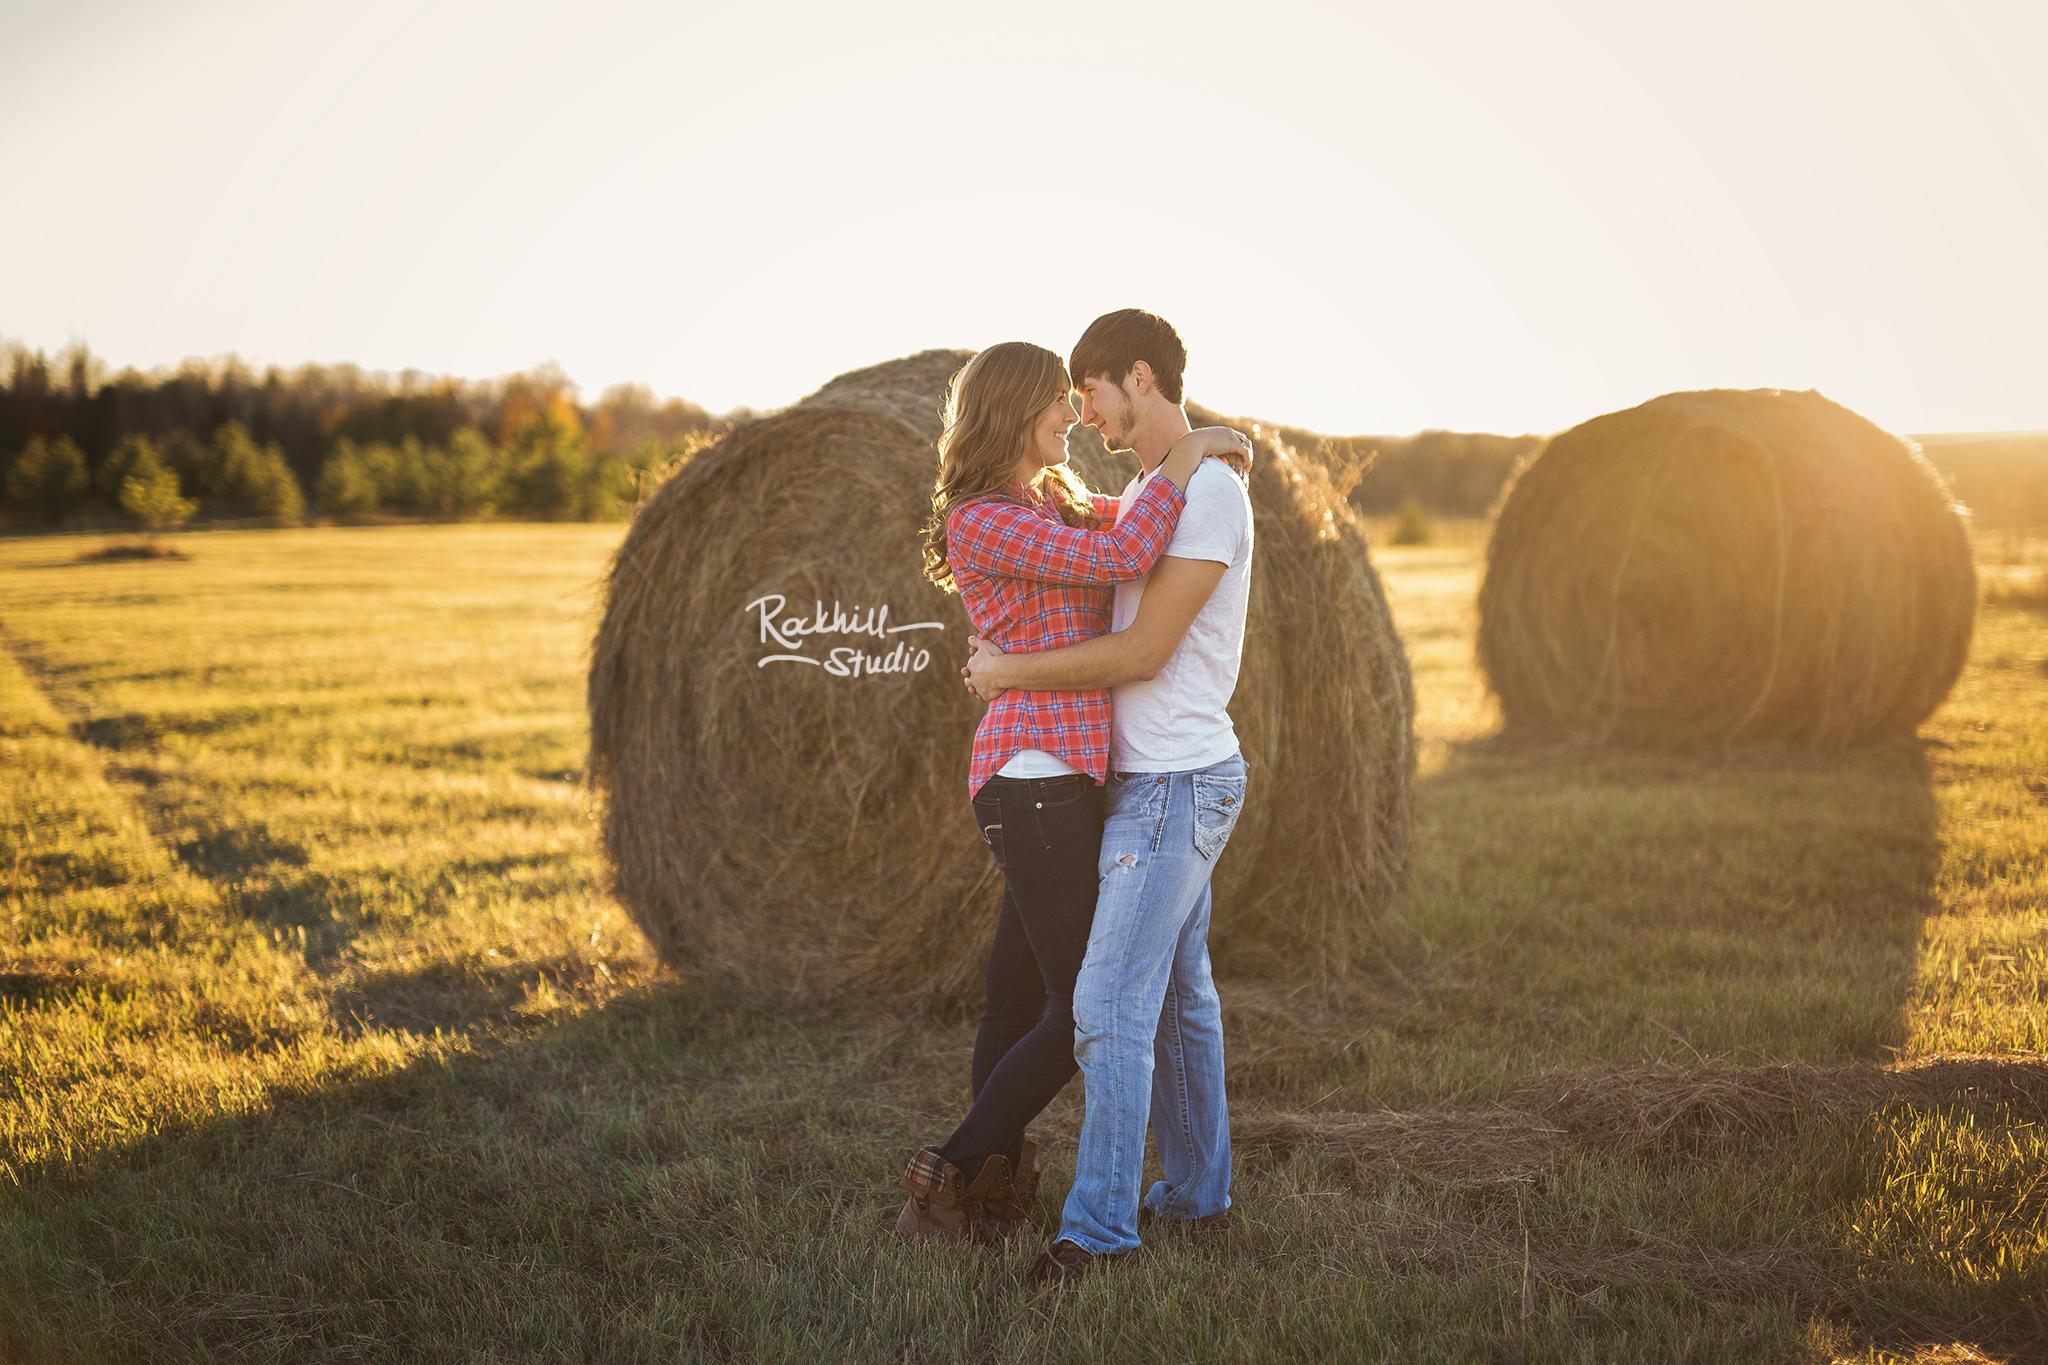 escanaba-engagment-photographer-wedding-couple-field-sunset.jpg